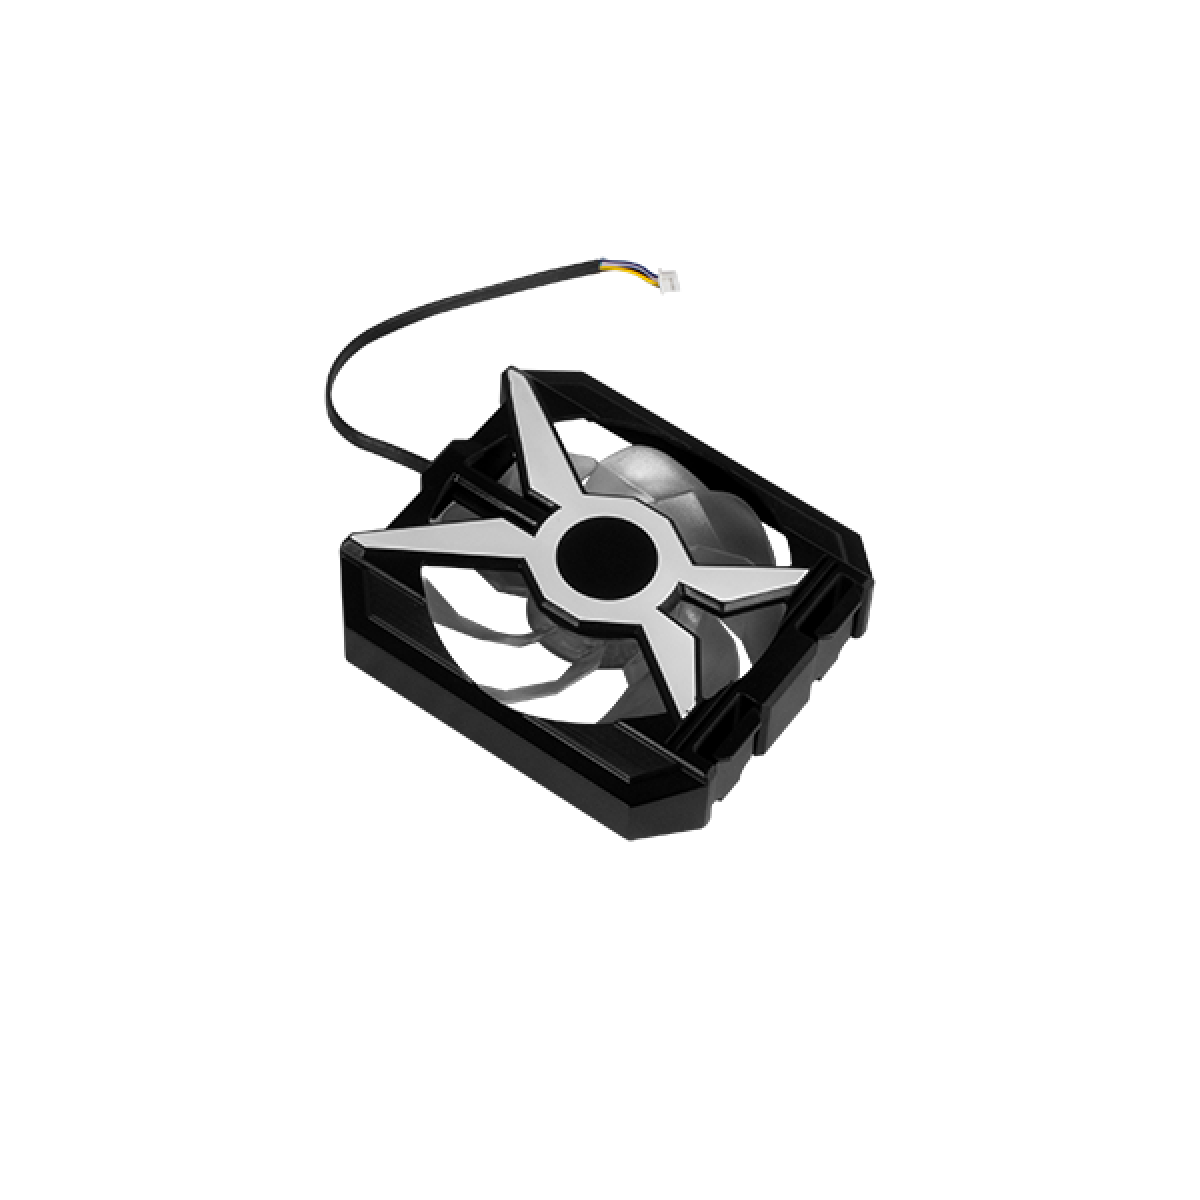 Placa de Vídeo Galax GeForce RTX 3080 Ti SG, 12GB, GDDR6X, 384bit, LHR, 38IOM5MD99DD